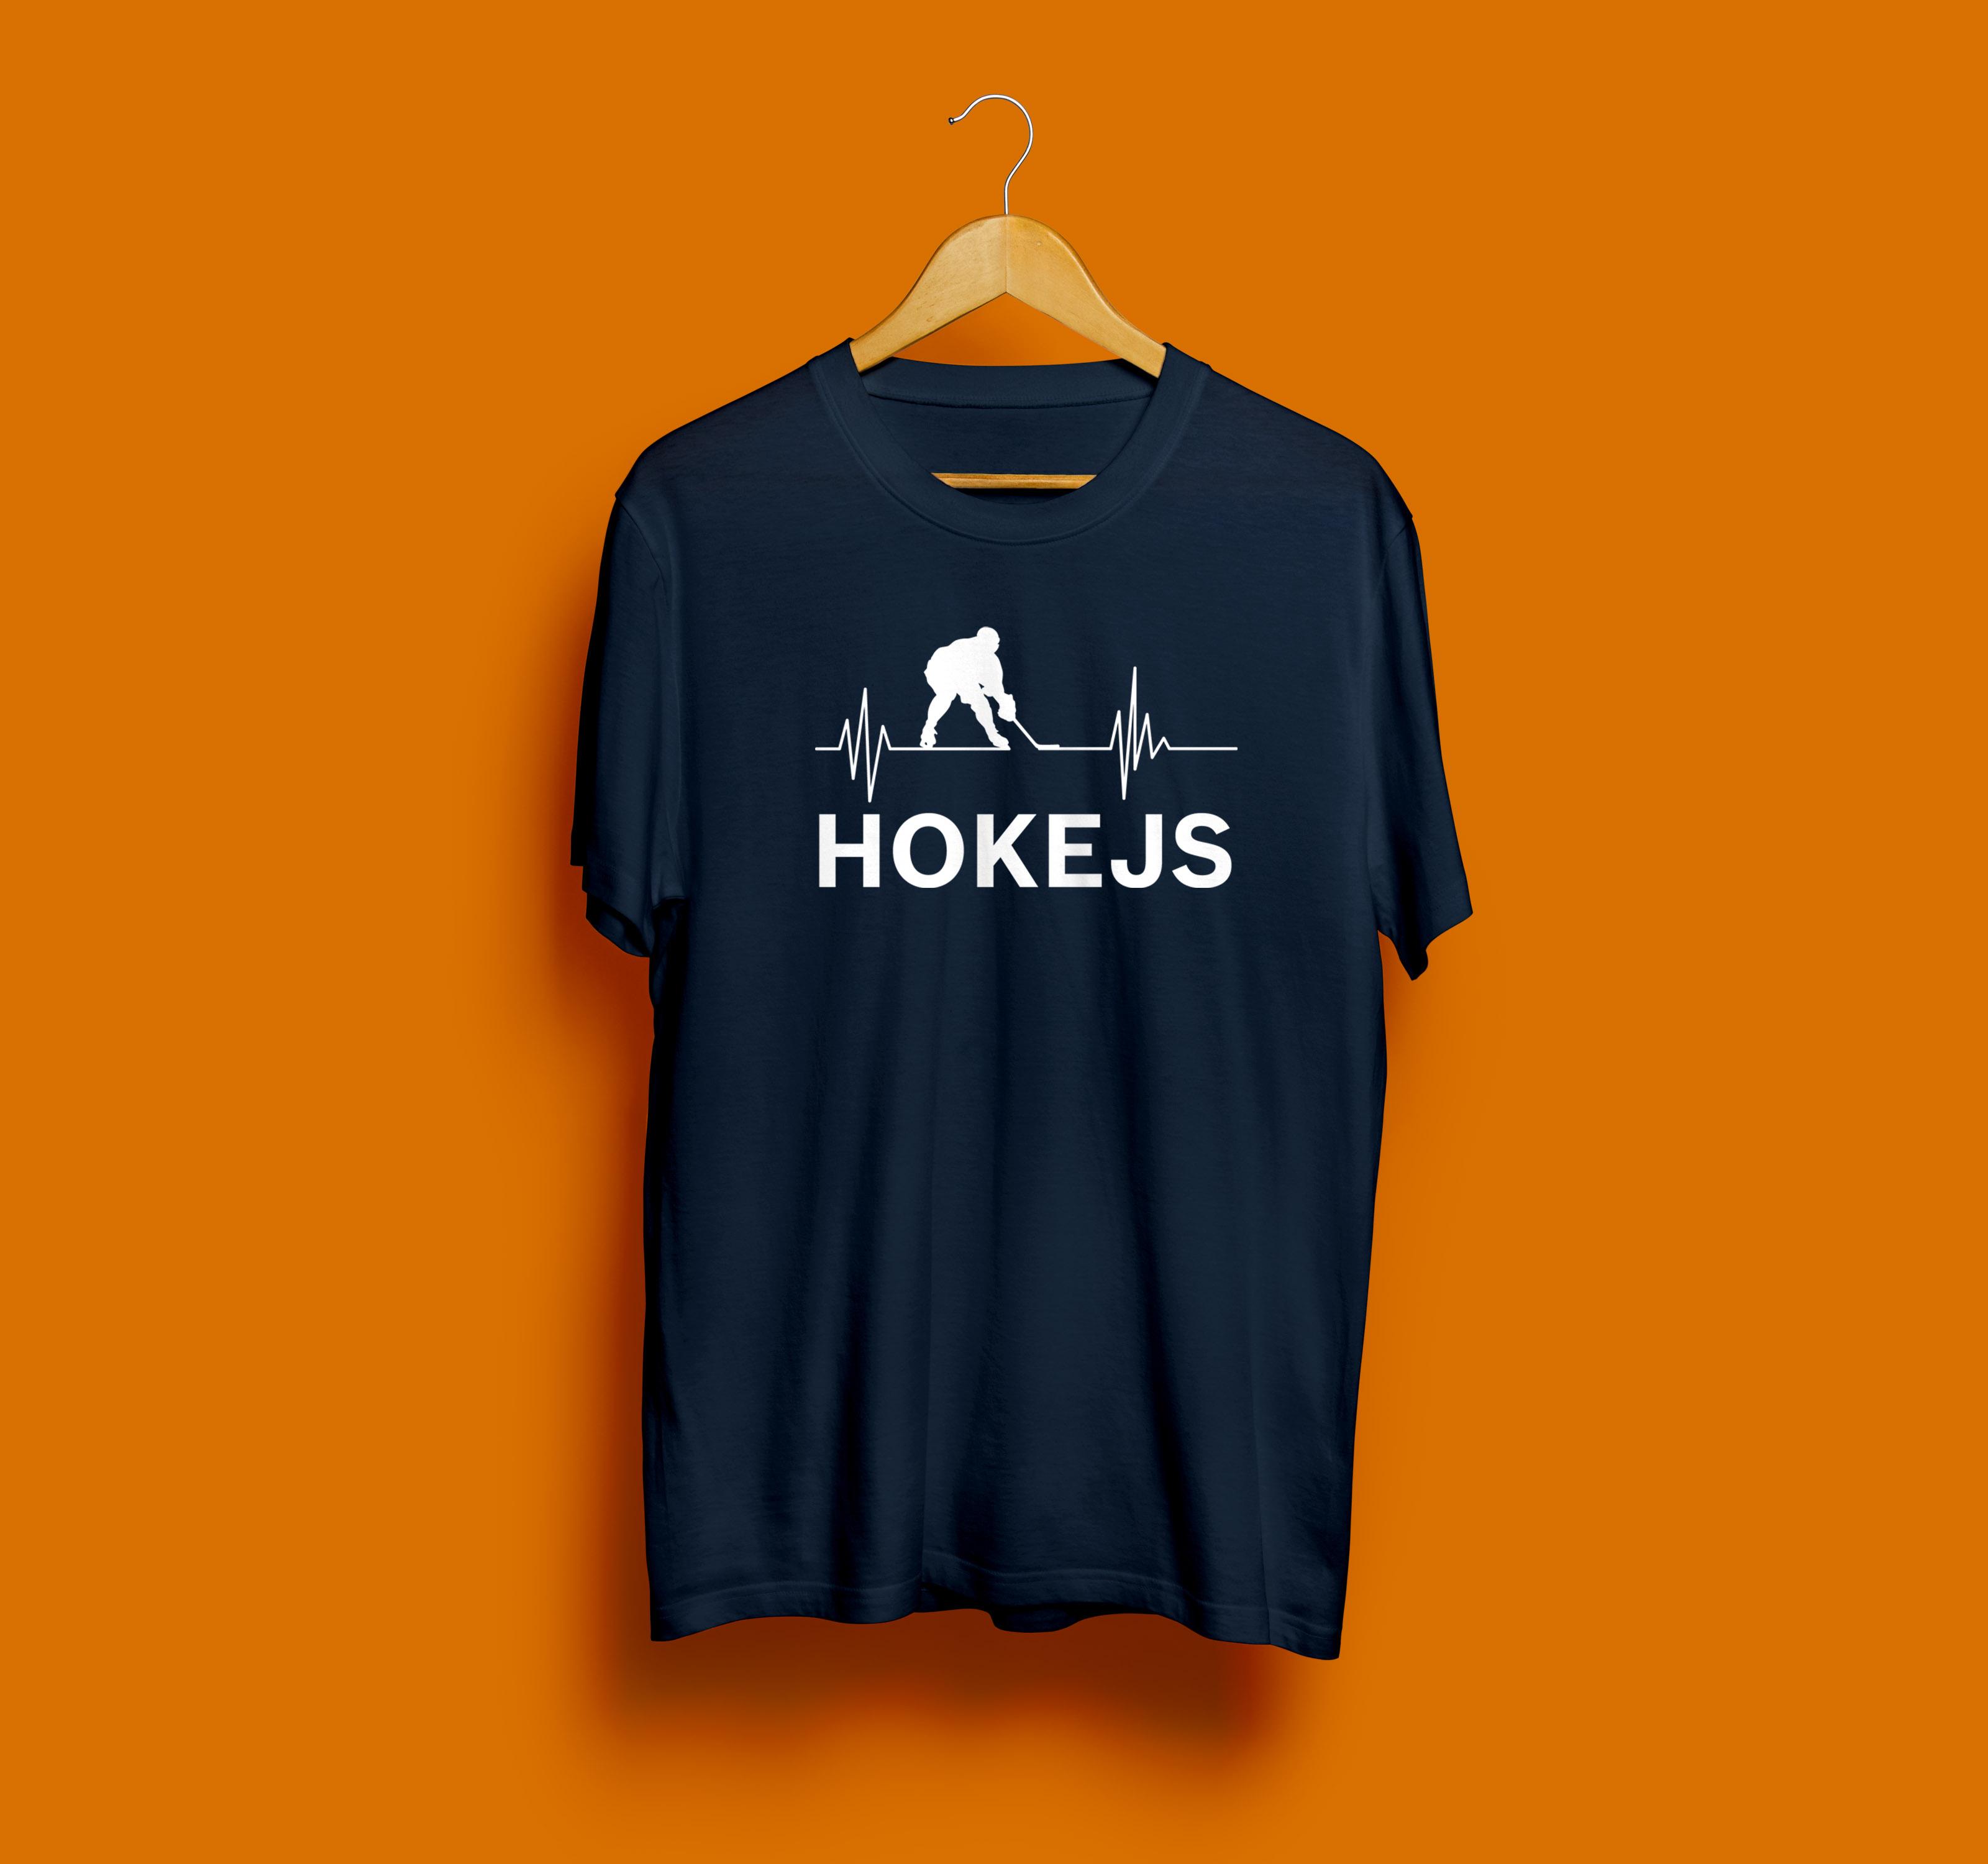 Hokeja sirds ritms Image